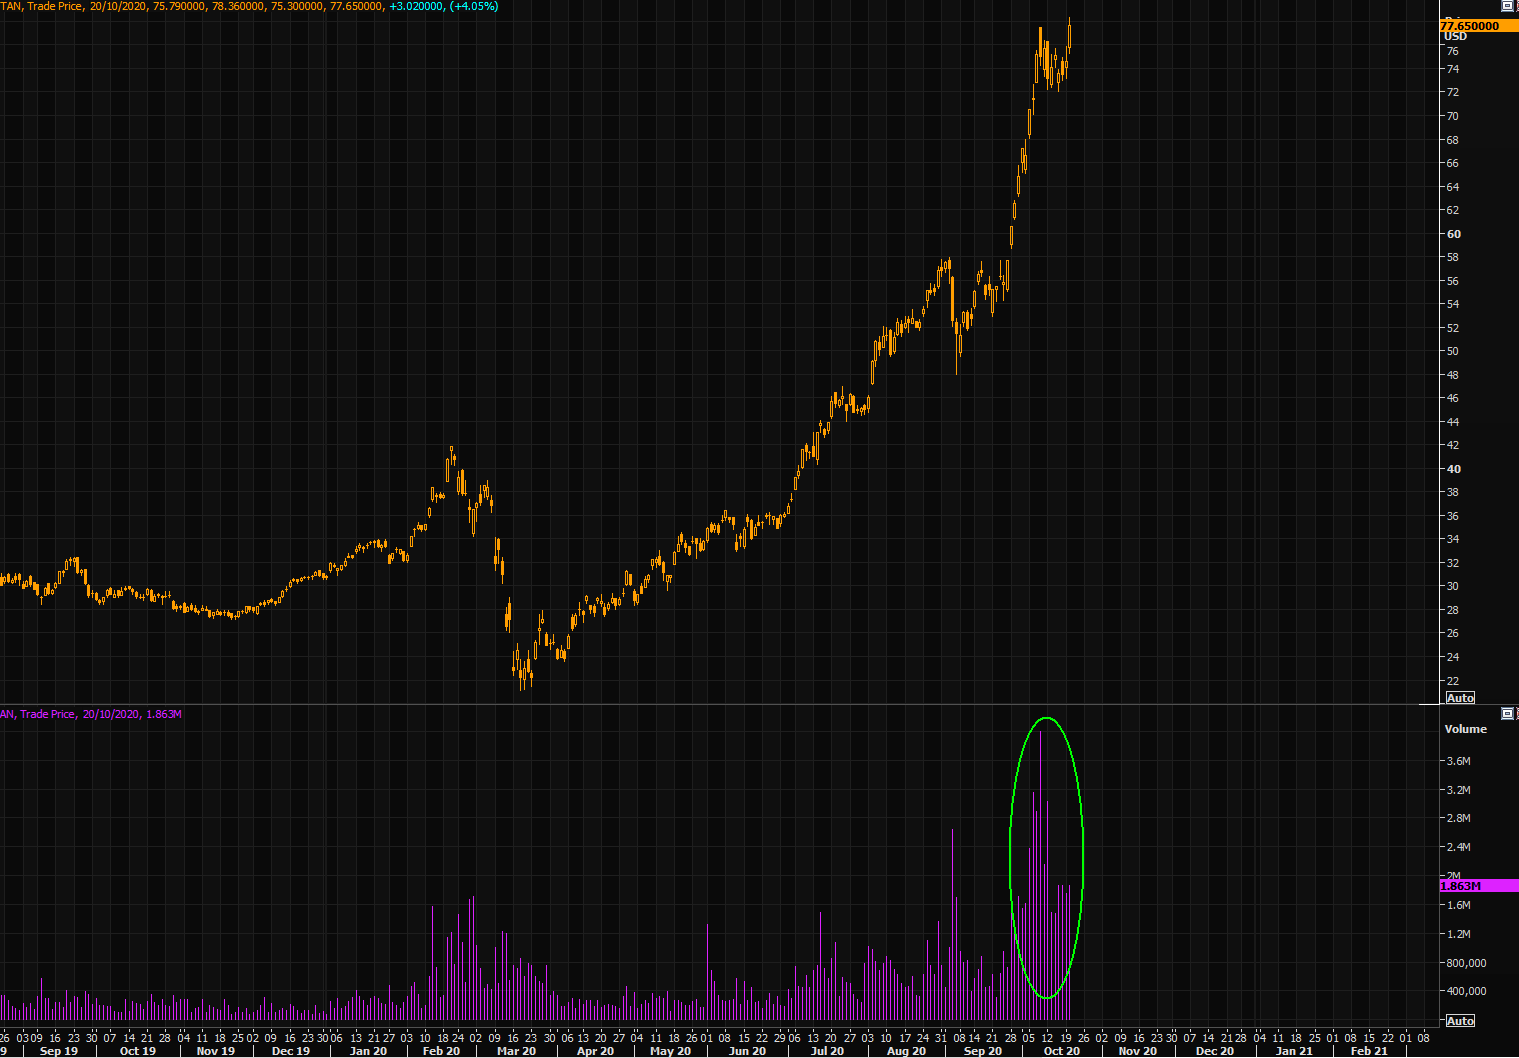 TAN ETF price and volume